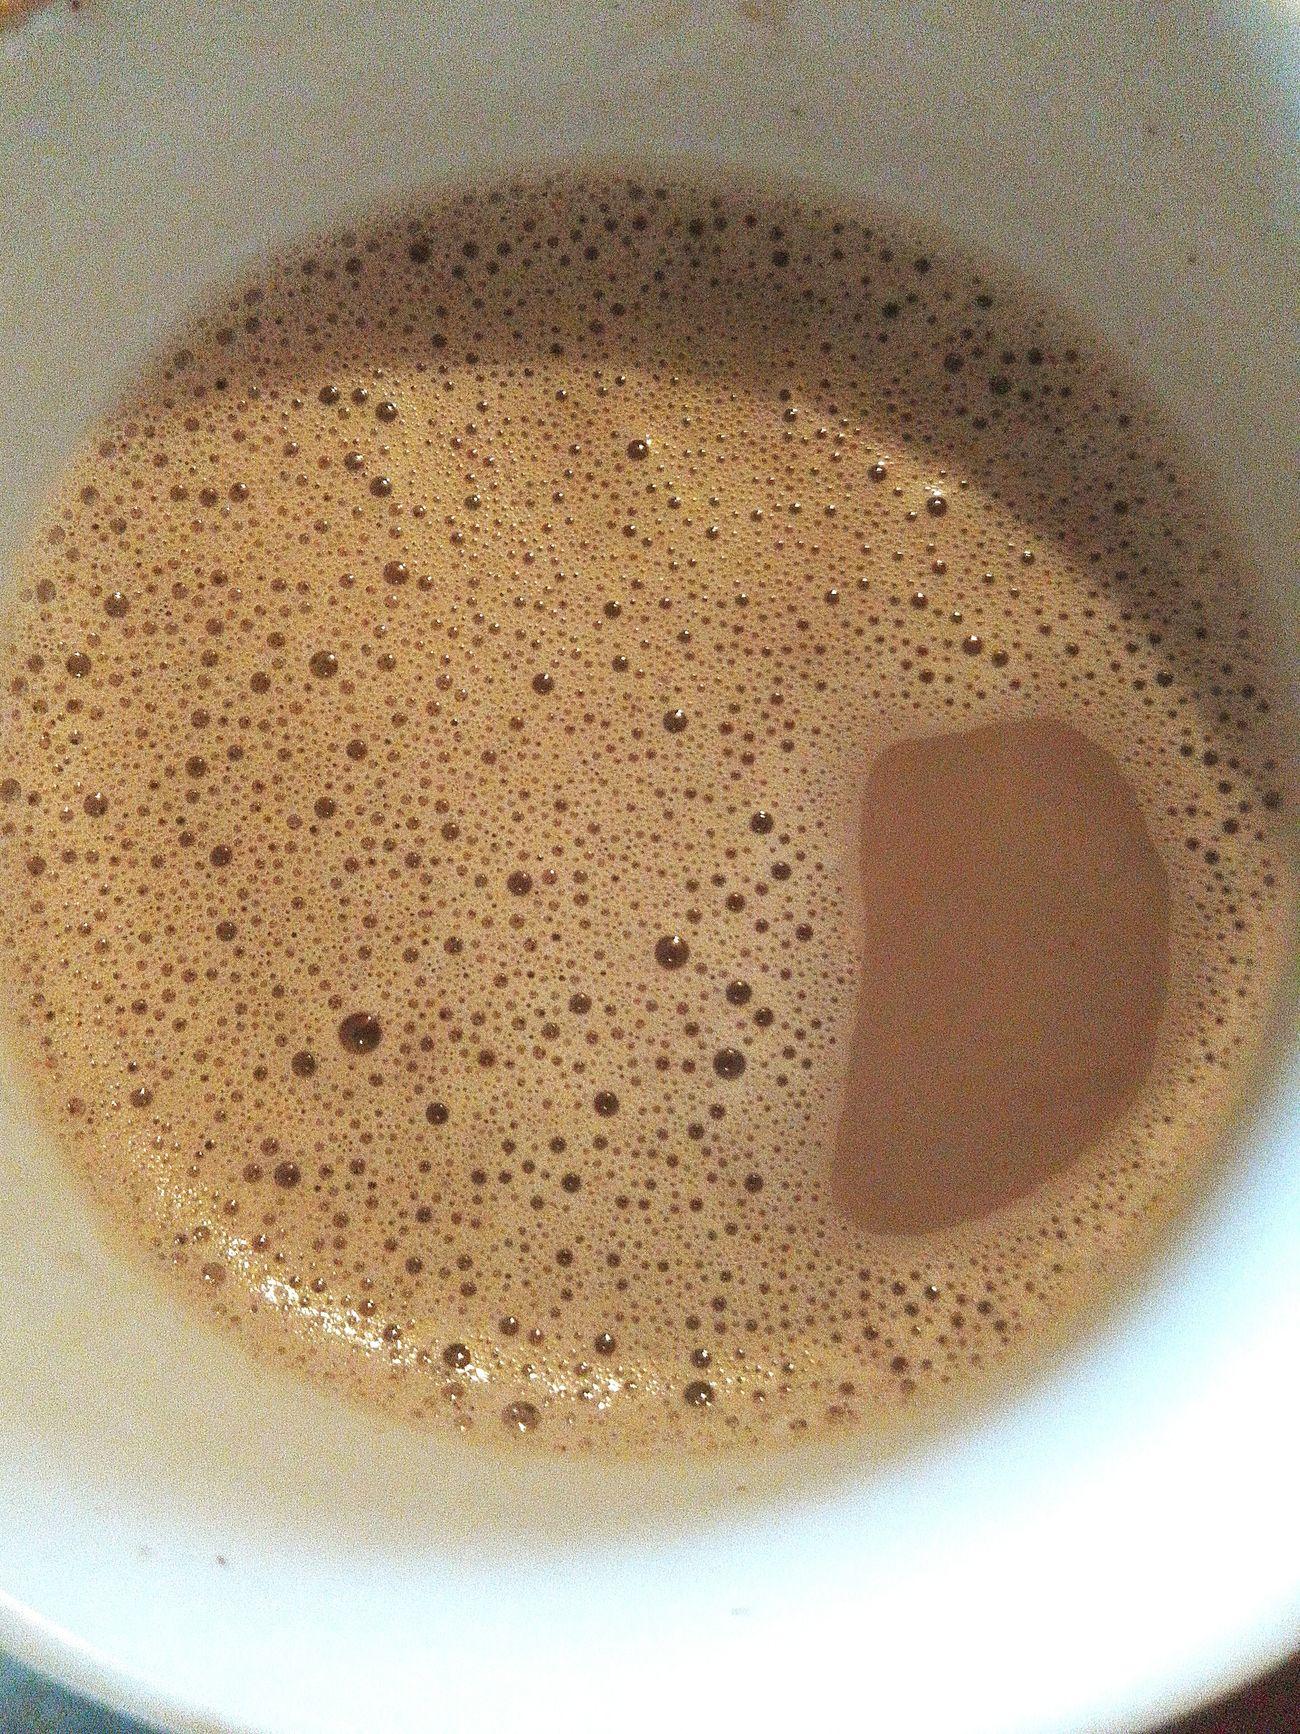 Liquid Lunch Hotchocolate Hotcoffee HotChocolate :)  HotCappuccino Hotchocolatetime